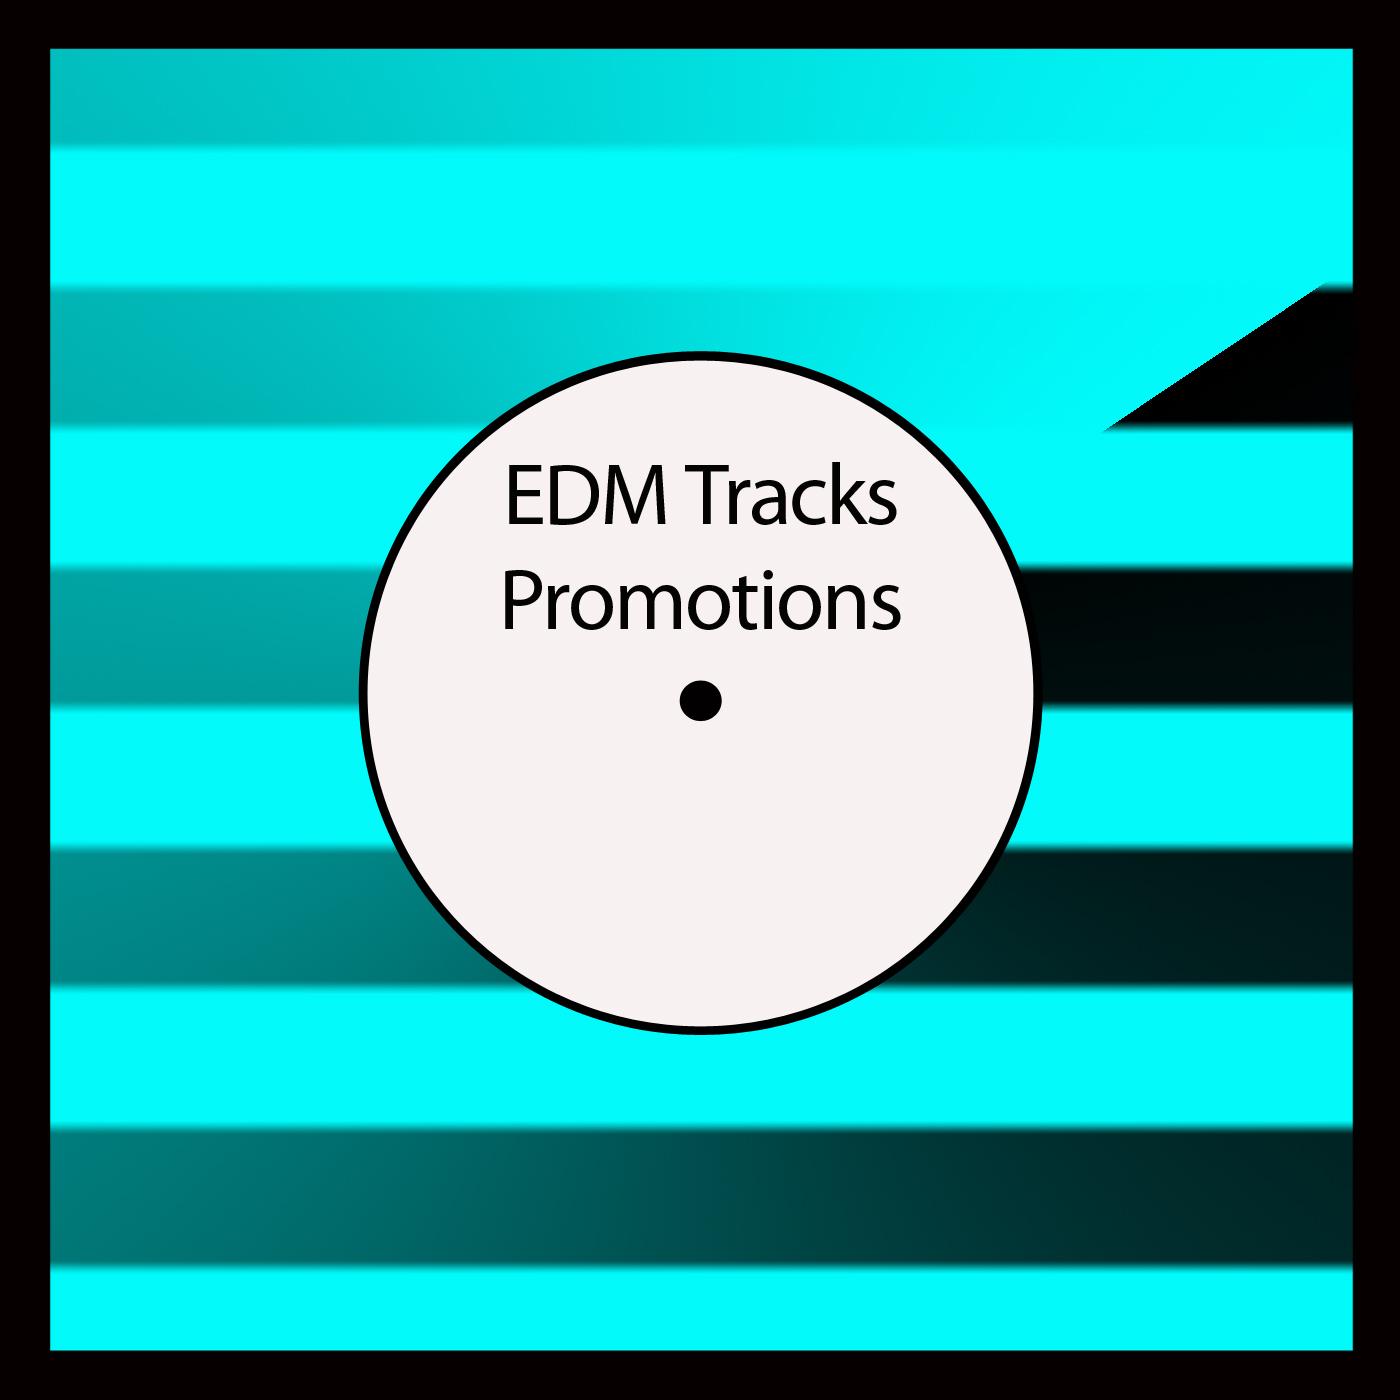 EDM Tracks Promotions